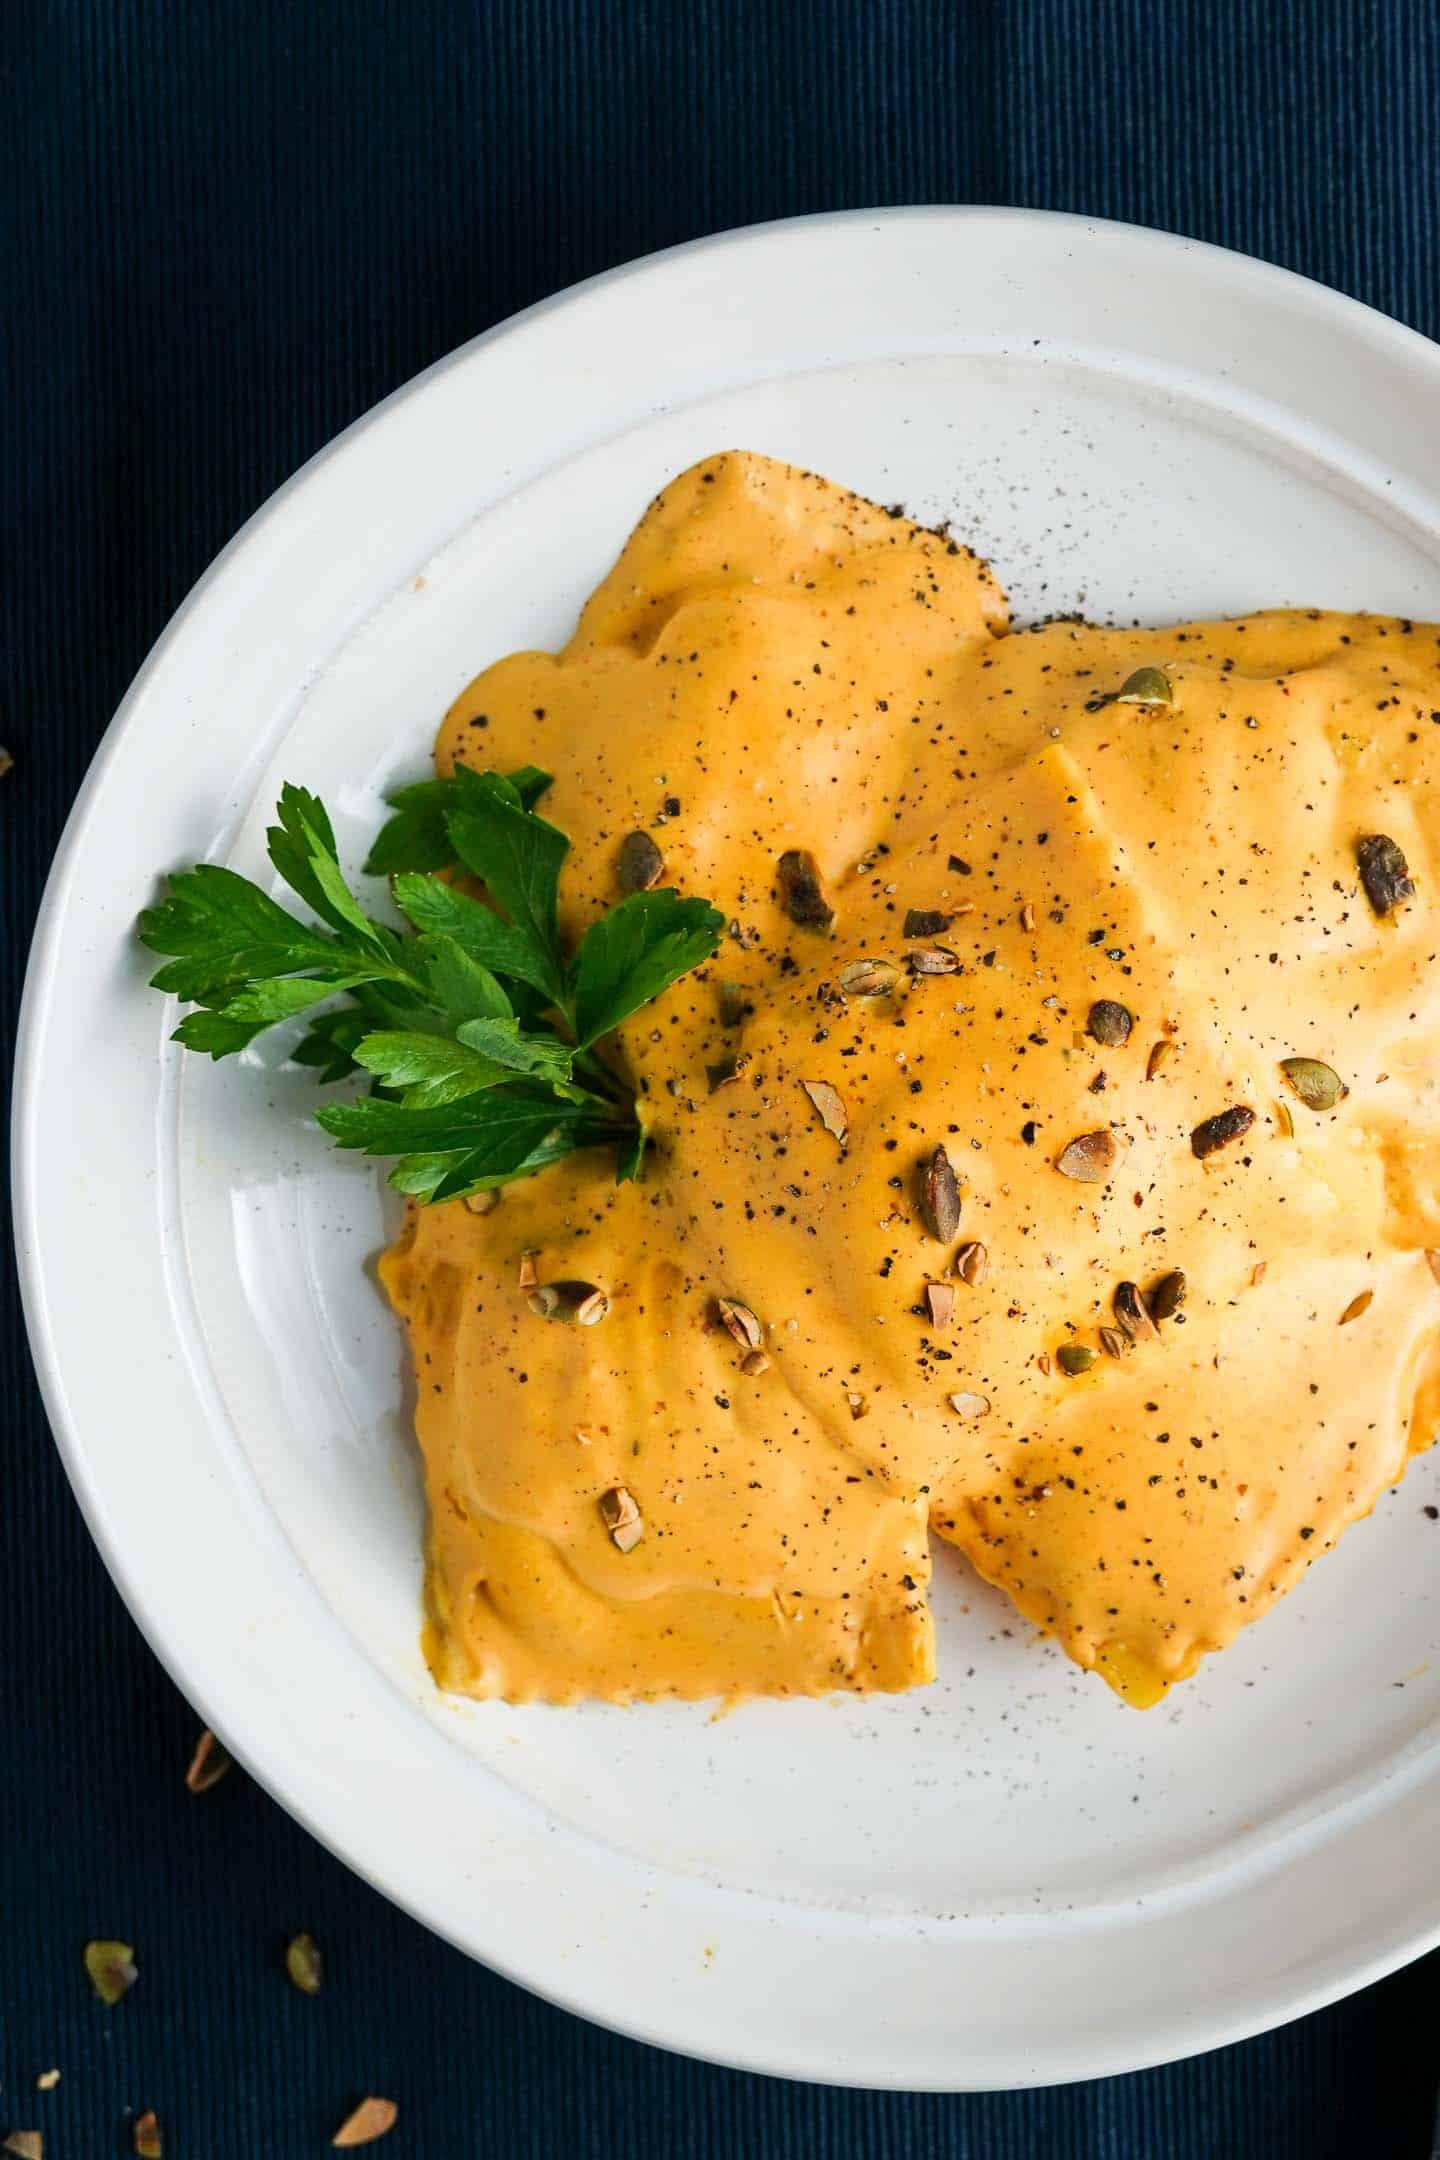 Ravioli with pumpkin cream sauce on white plate